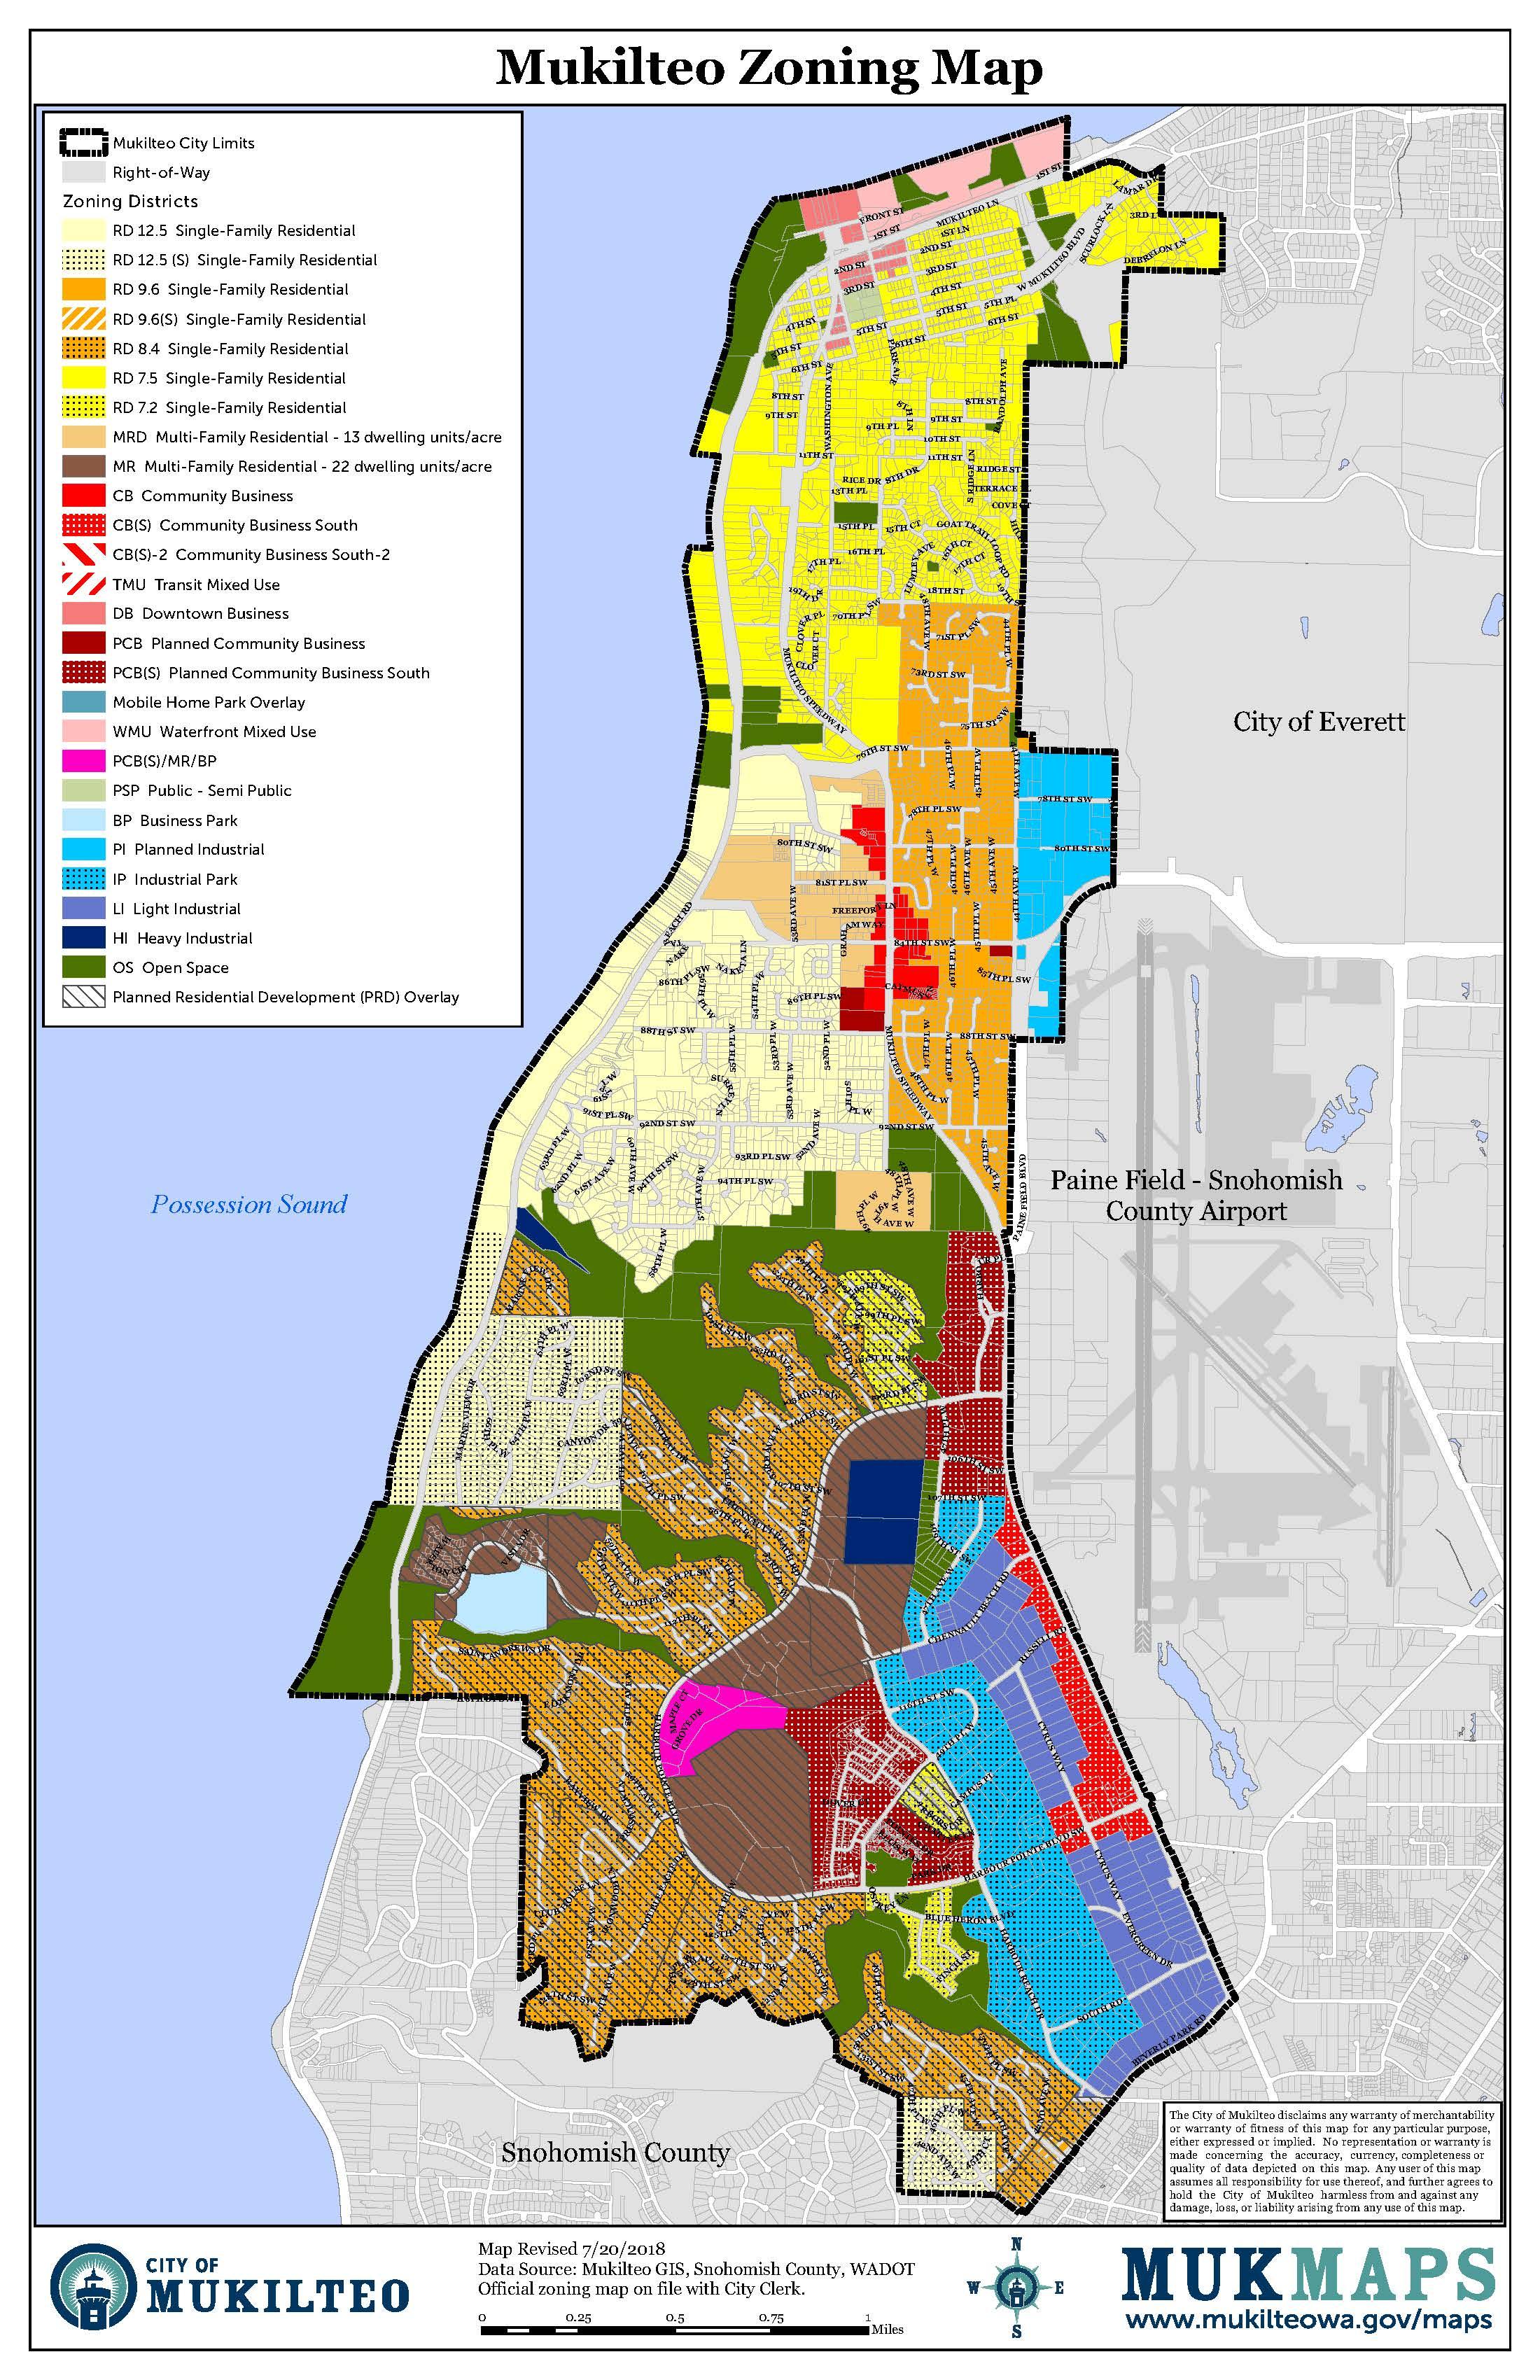 Zoning map of Mukilteo can be found at  https://mukilteowa.gov/wp-content/uploads/Zoning-Map.pdf